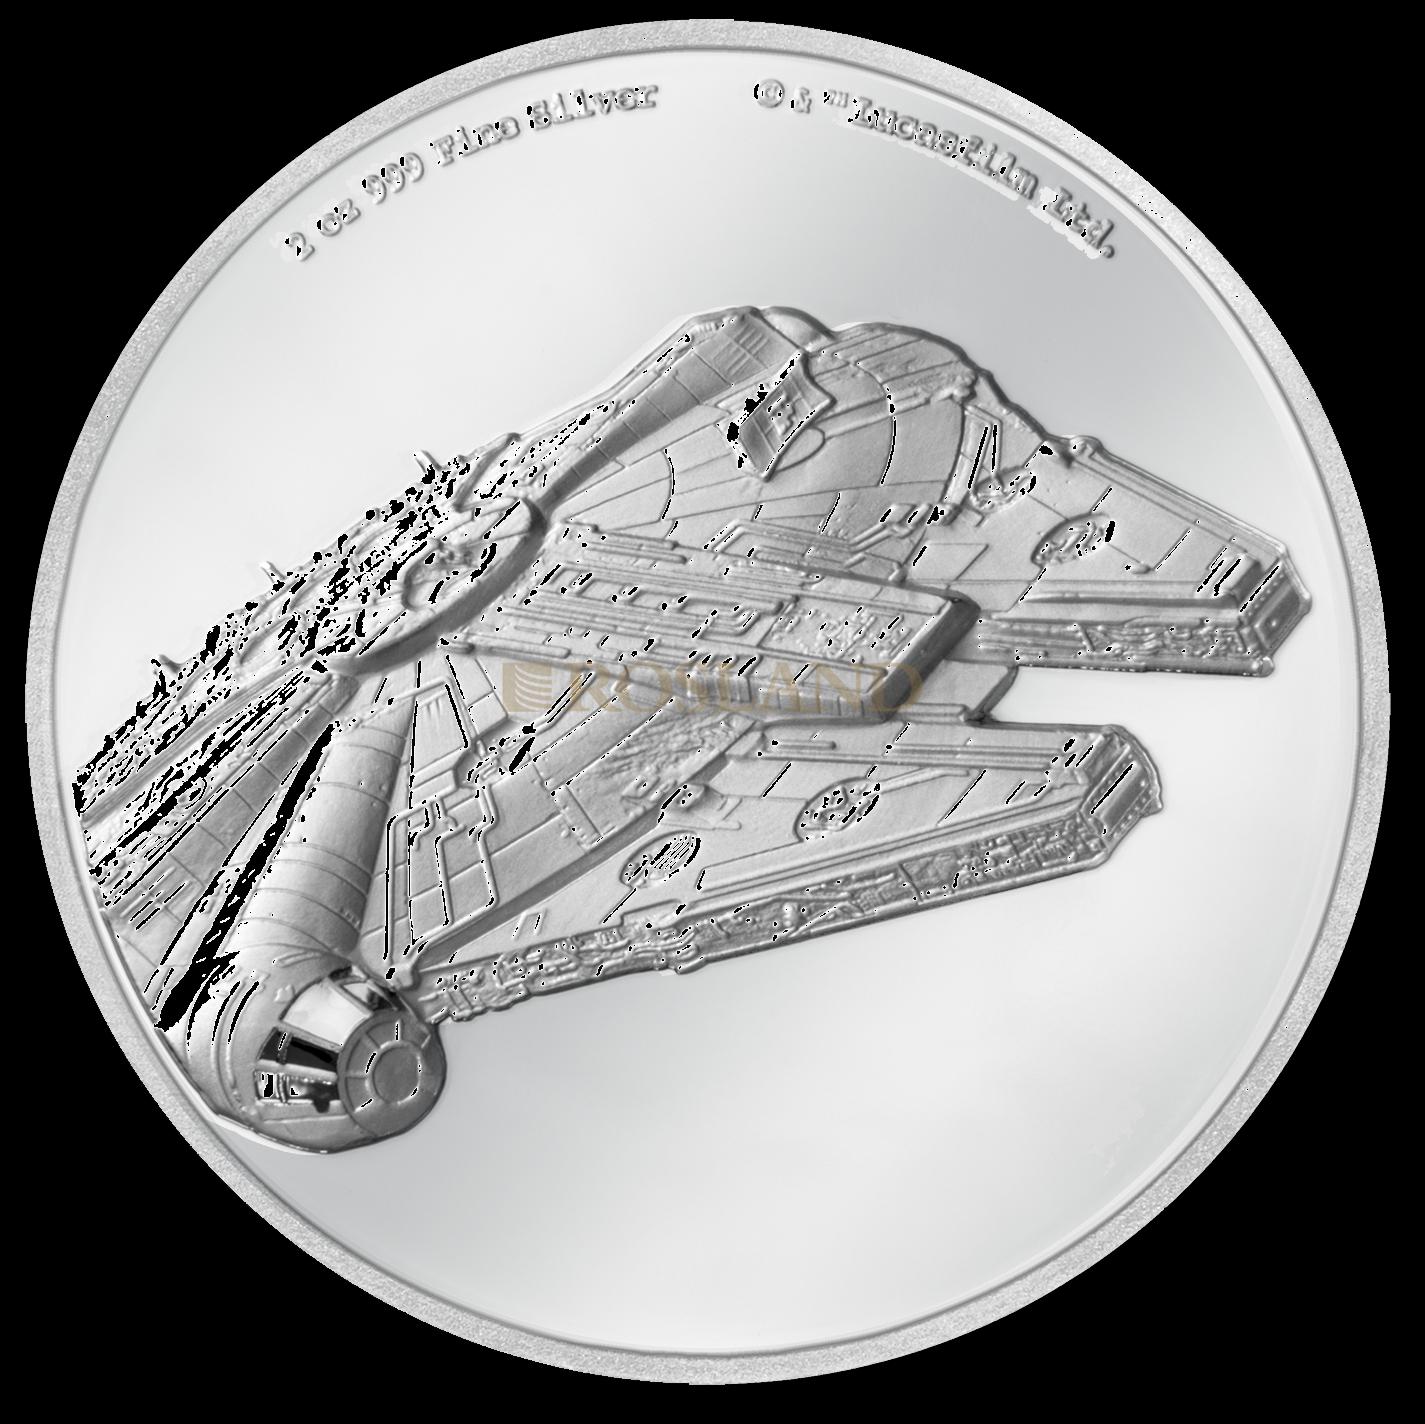 2 Unzen Silbermünze Star Wars™ Millenium Falke 2019 PP (UHR, Box, Zertifikat)